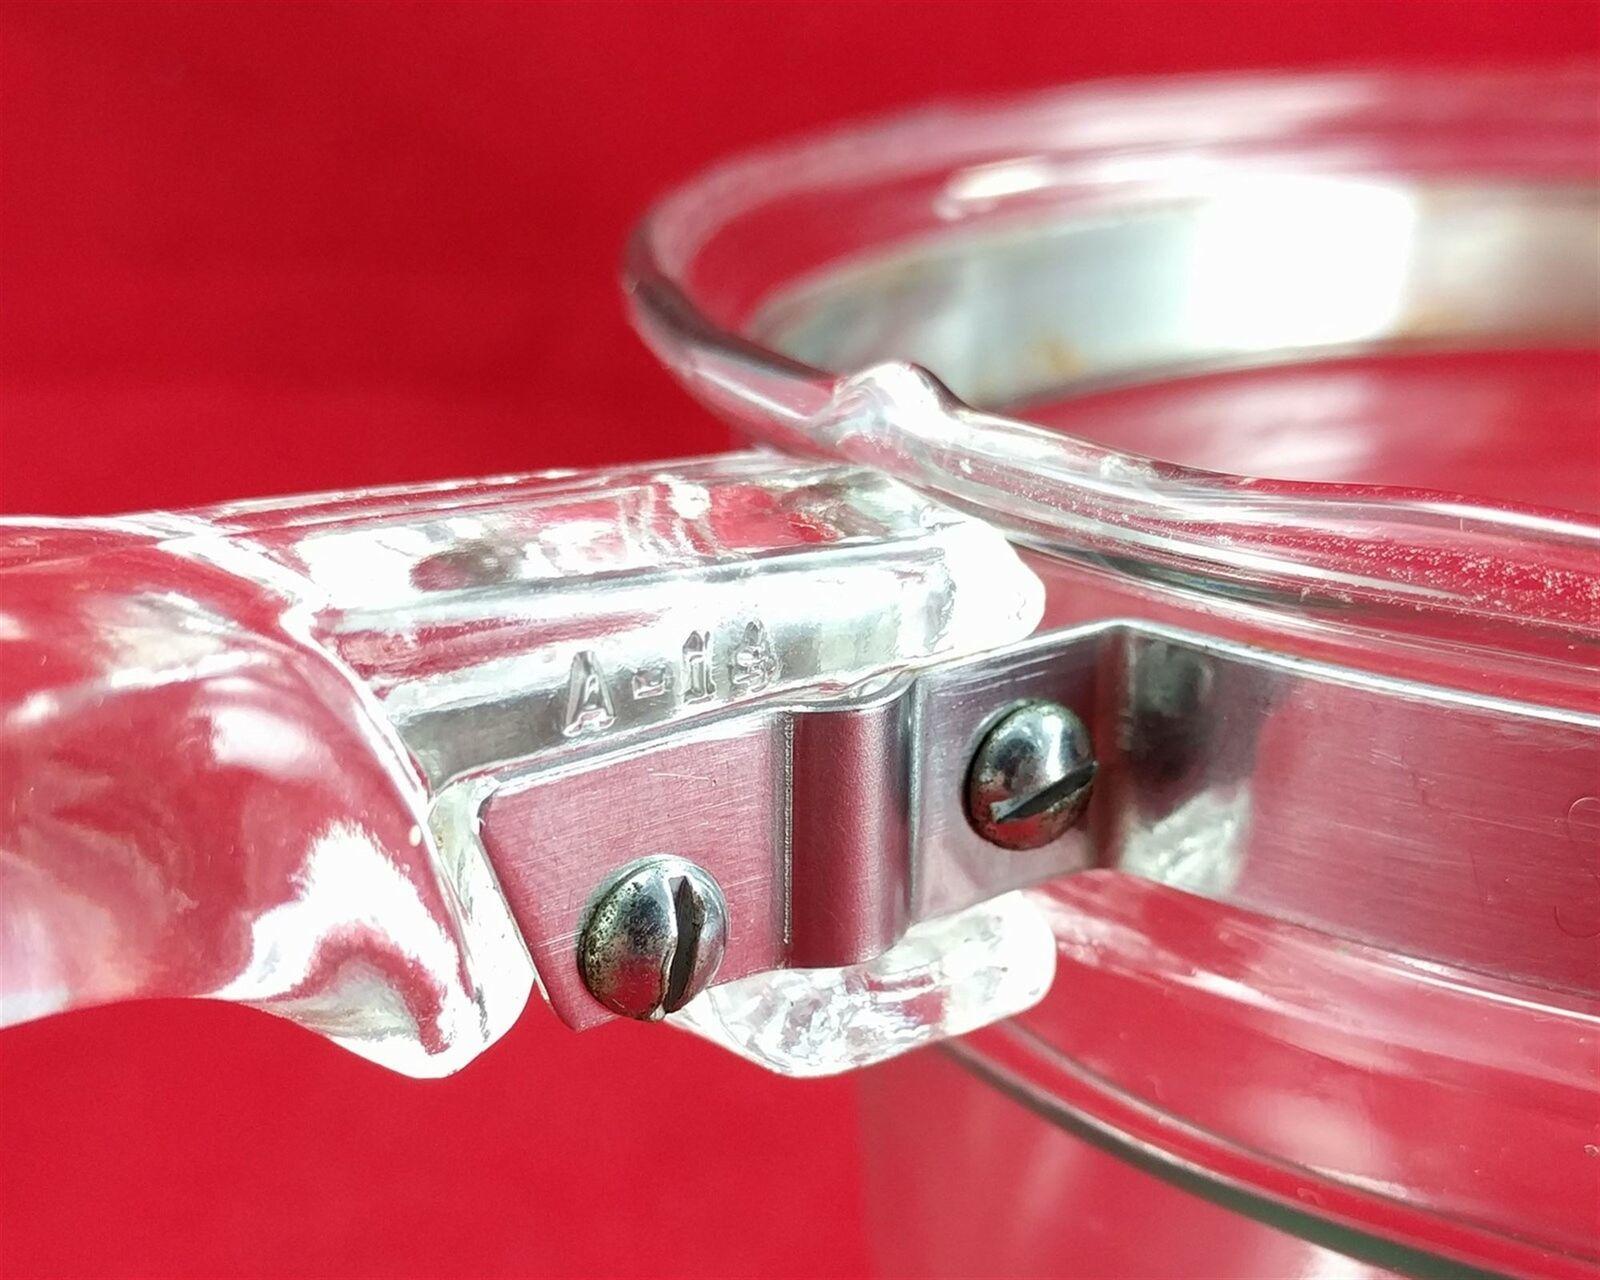 Pyrex Flameware 6283U 1½ qt Vintage Glass Saucepan w/ Stainless Steel Band image 7